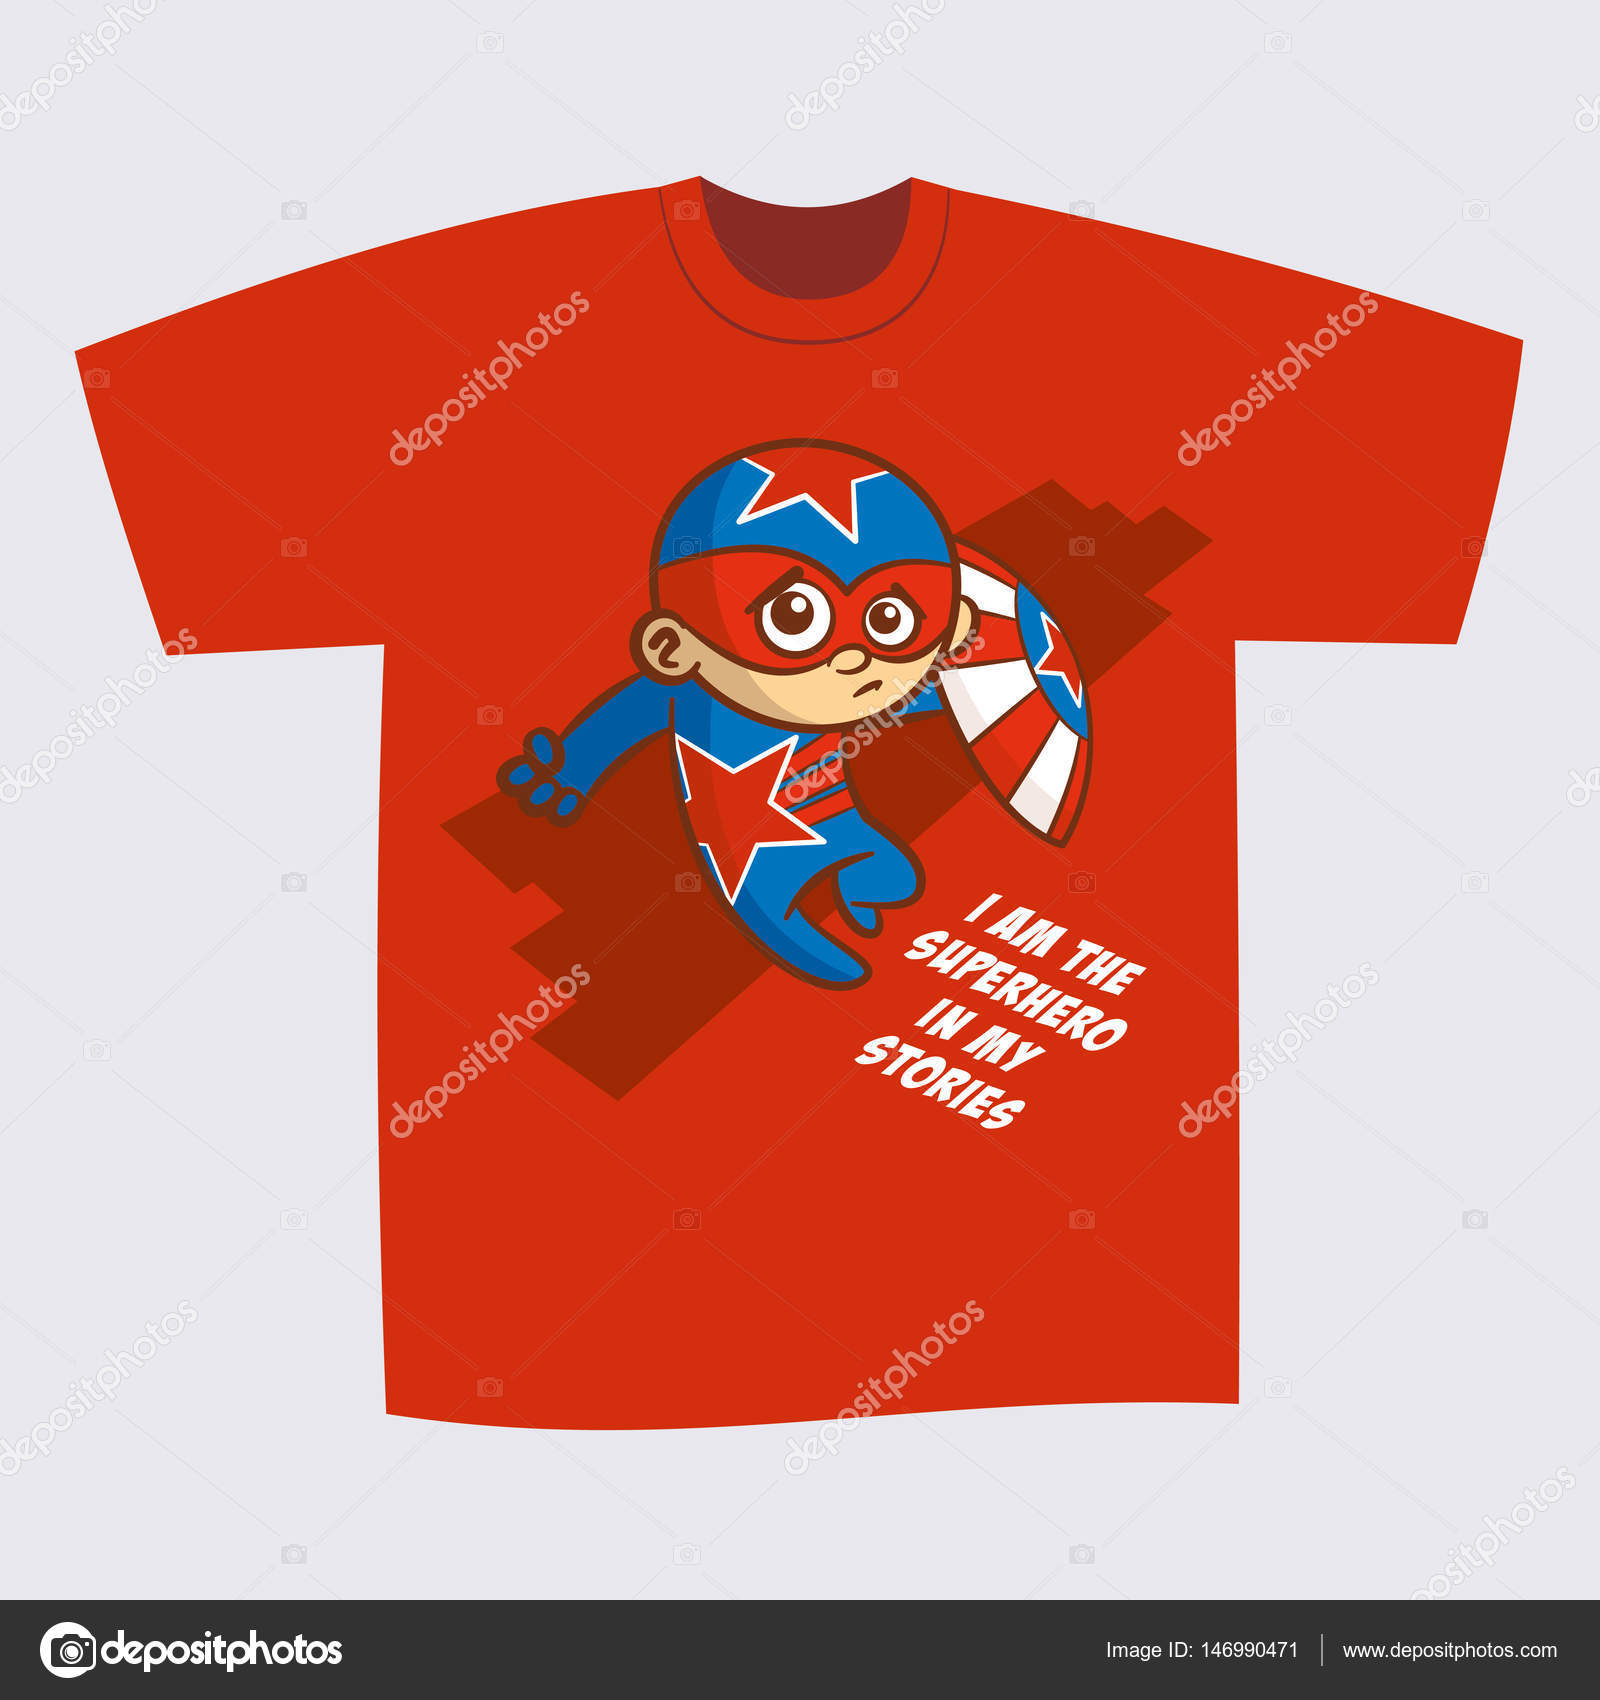 d39d9aed T-shirt Red Print Design Superhero — Stock Vector © ichbinsam #146990471